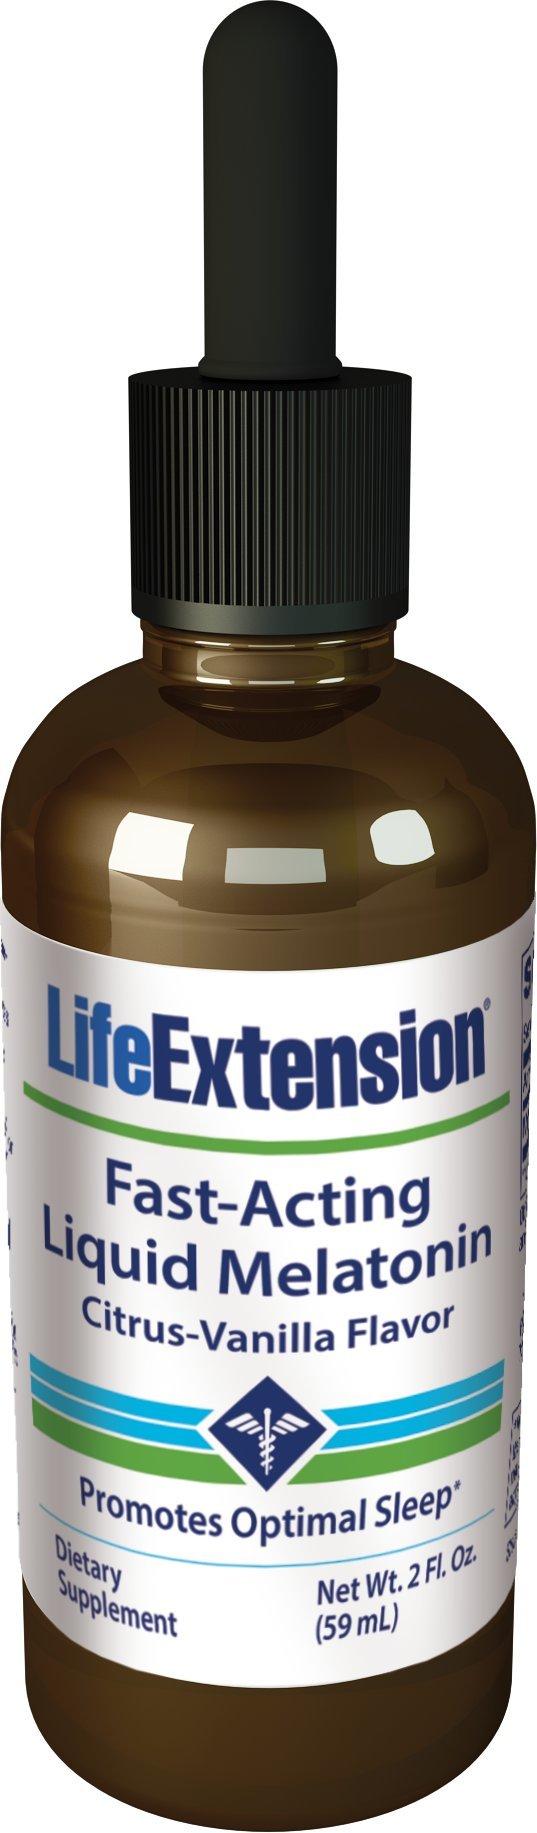 Life Extension Fast-Acting Liquid Melatonin Citrus-Vanilla Flavor, 2 Fl. Ounce